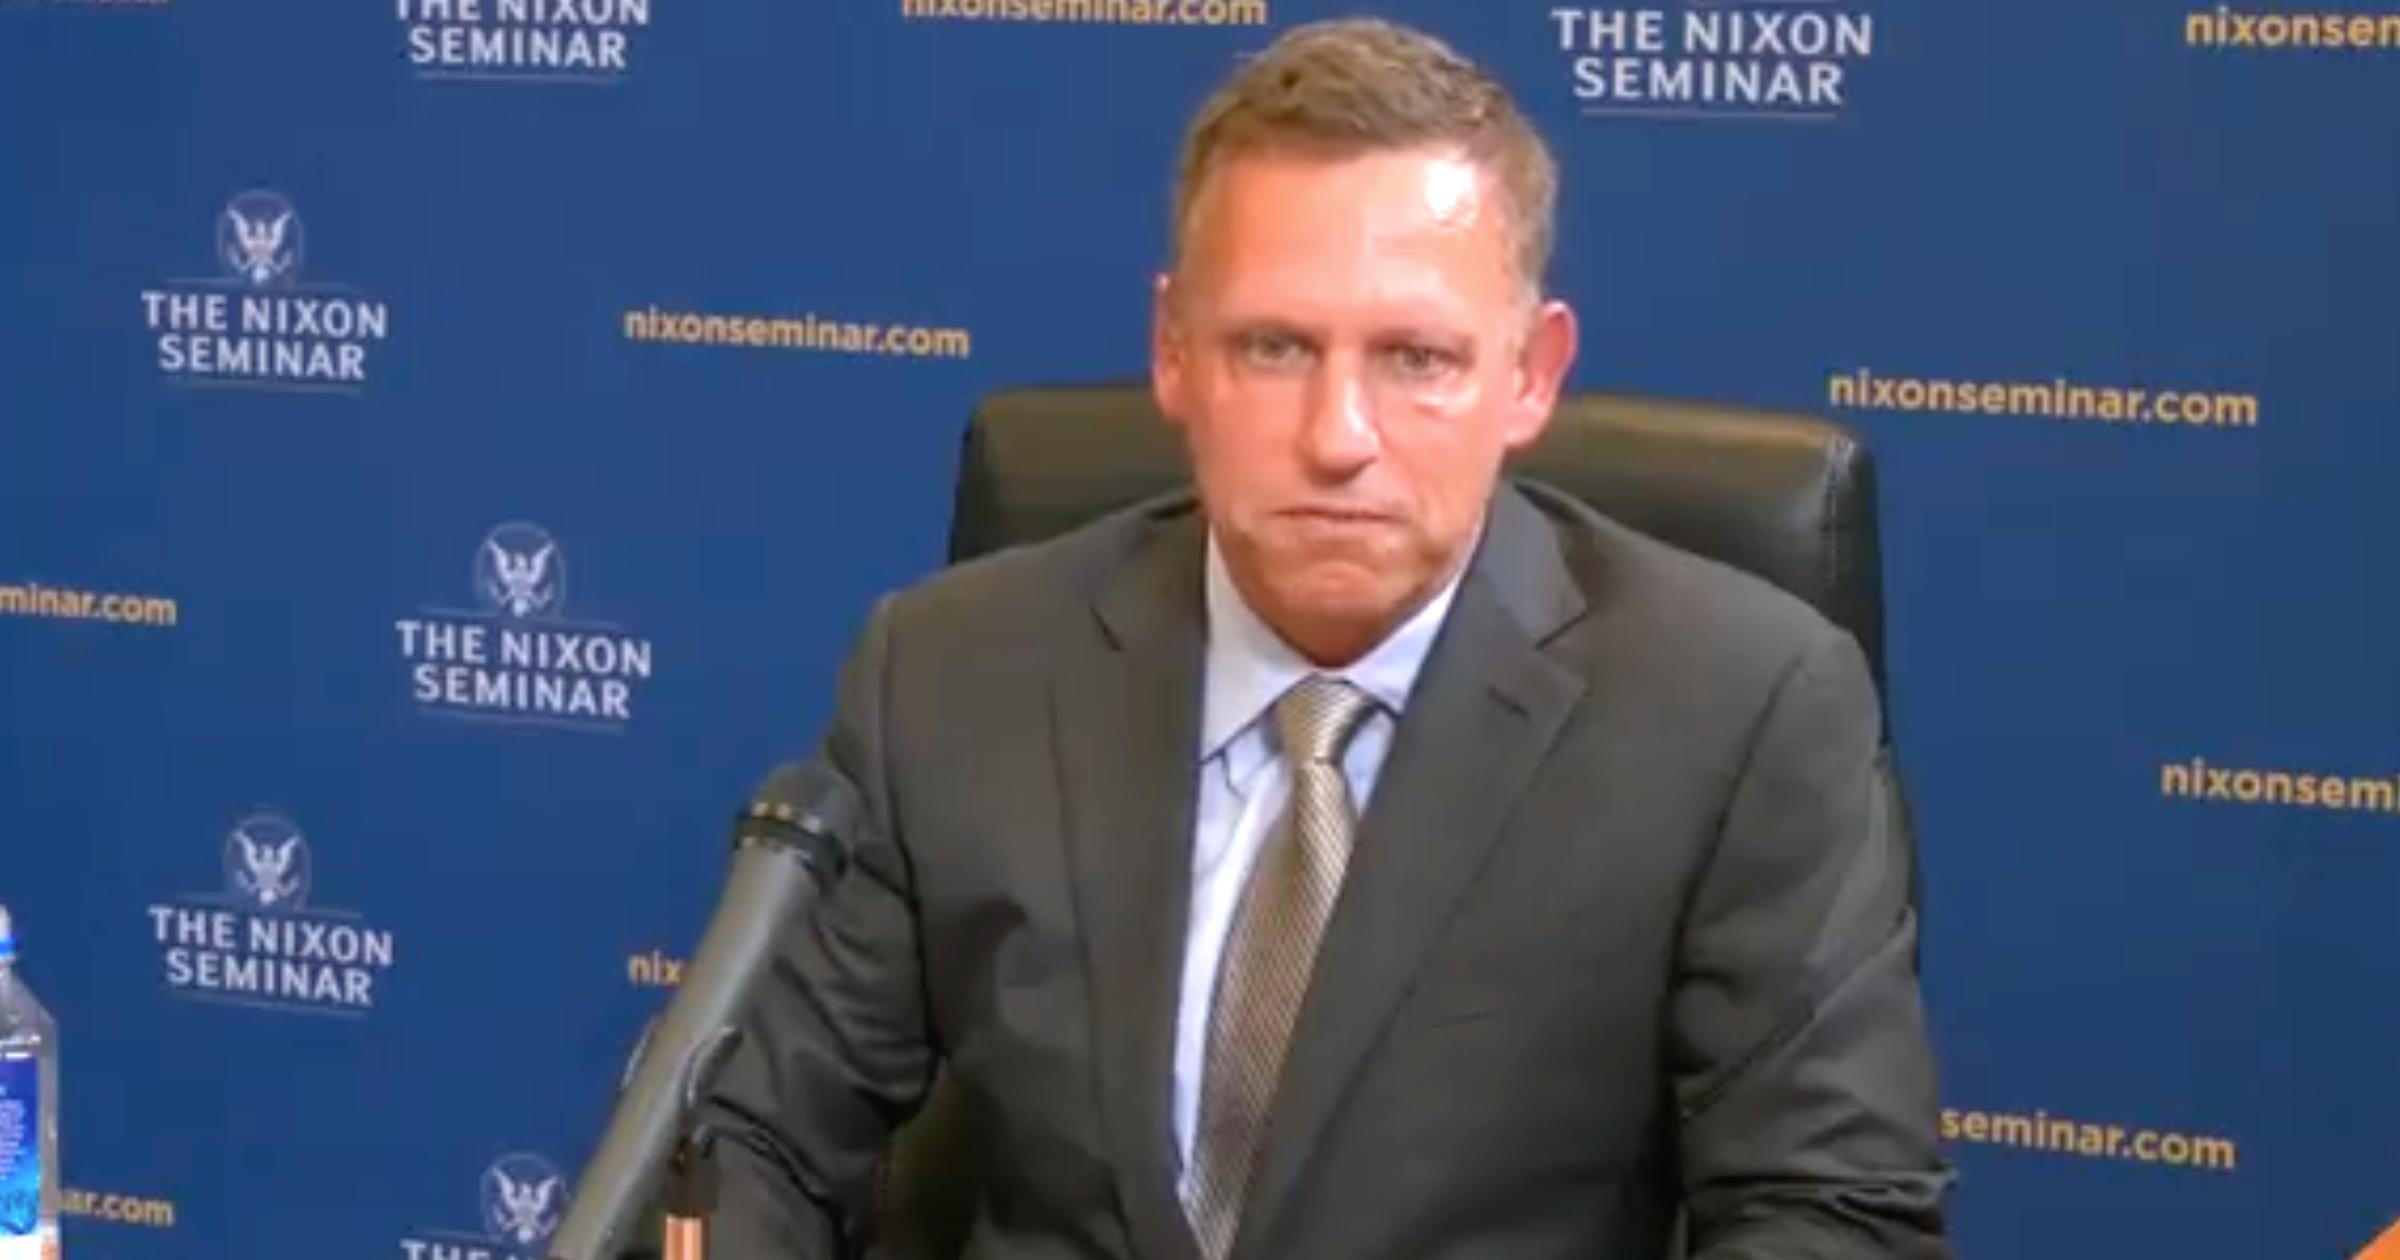 Peter Thiel at Richard Nixon Foundation